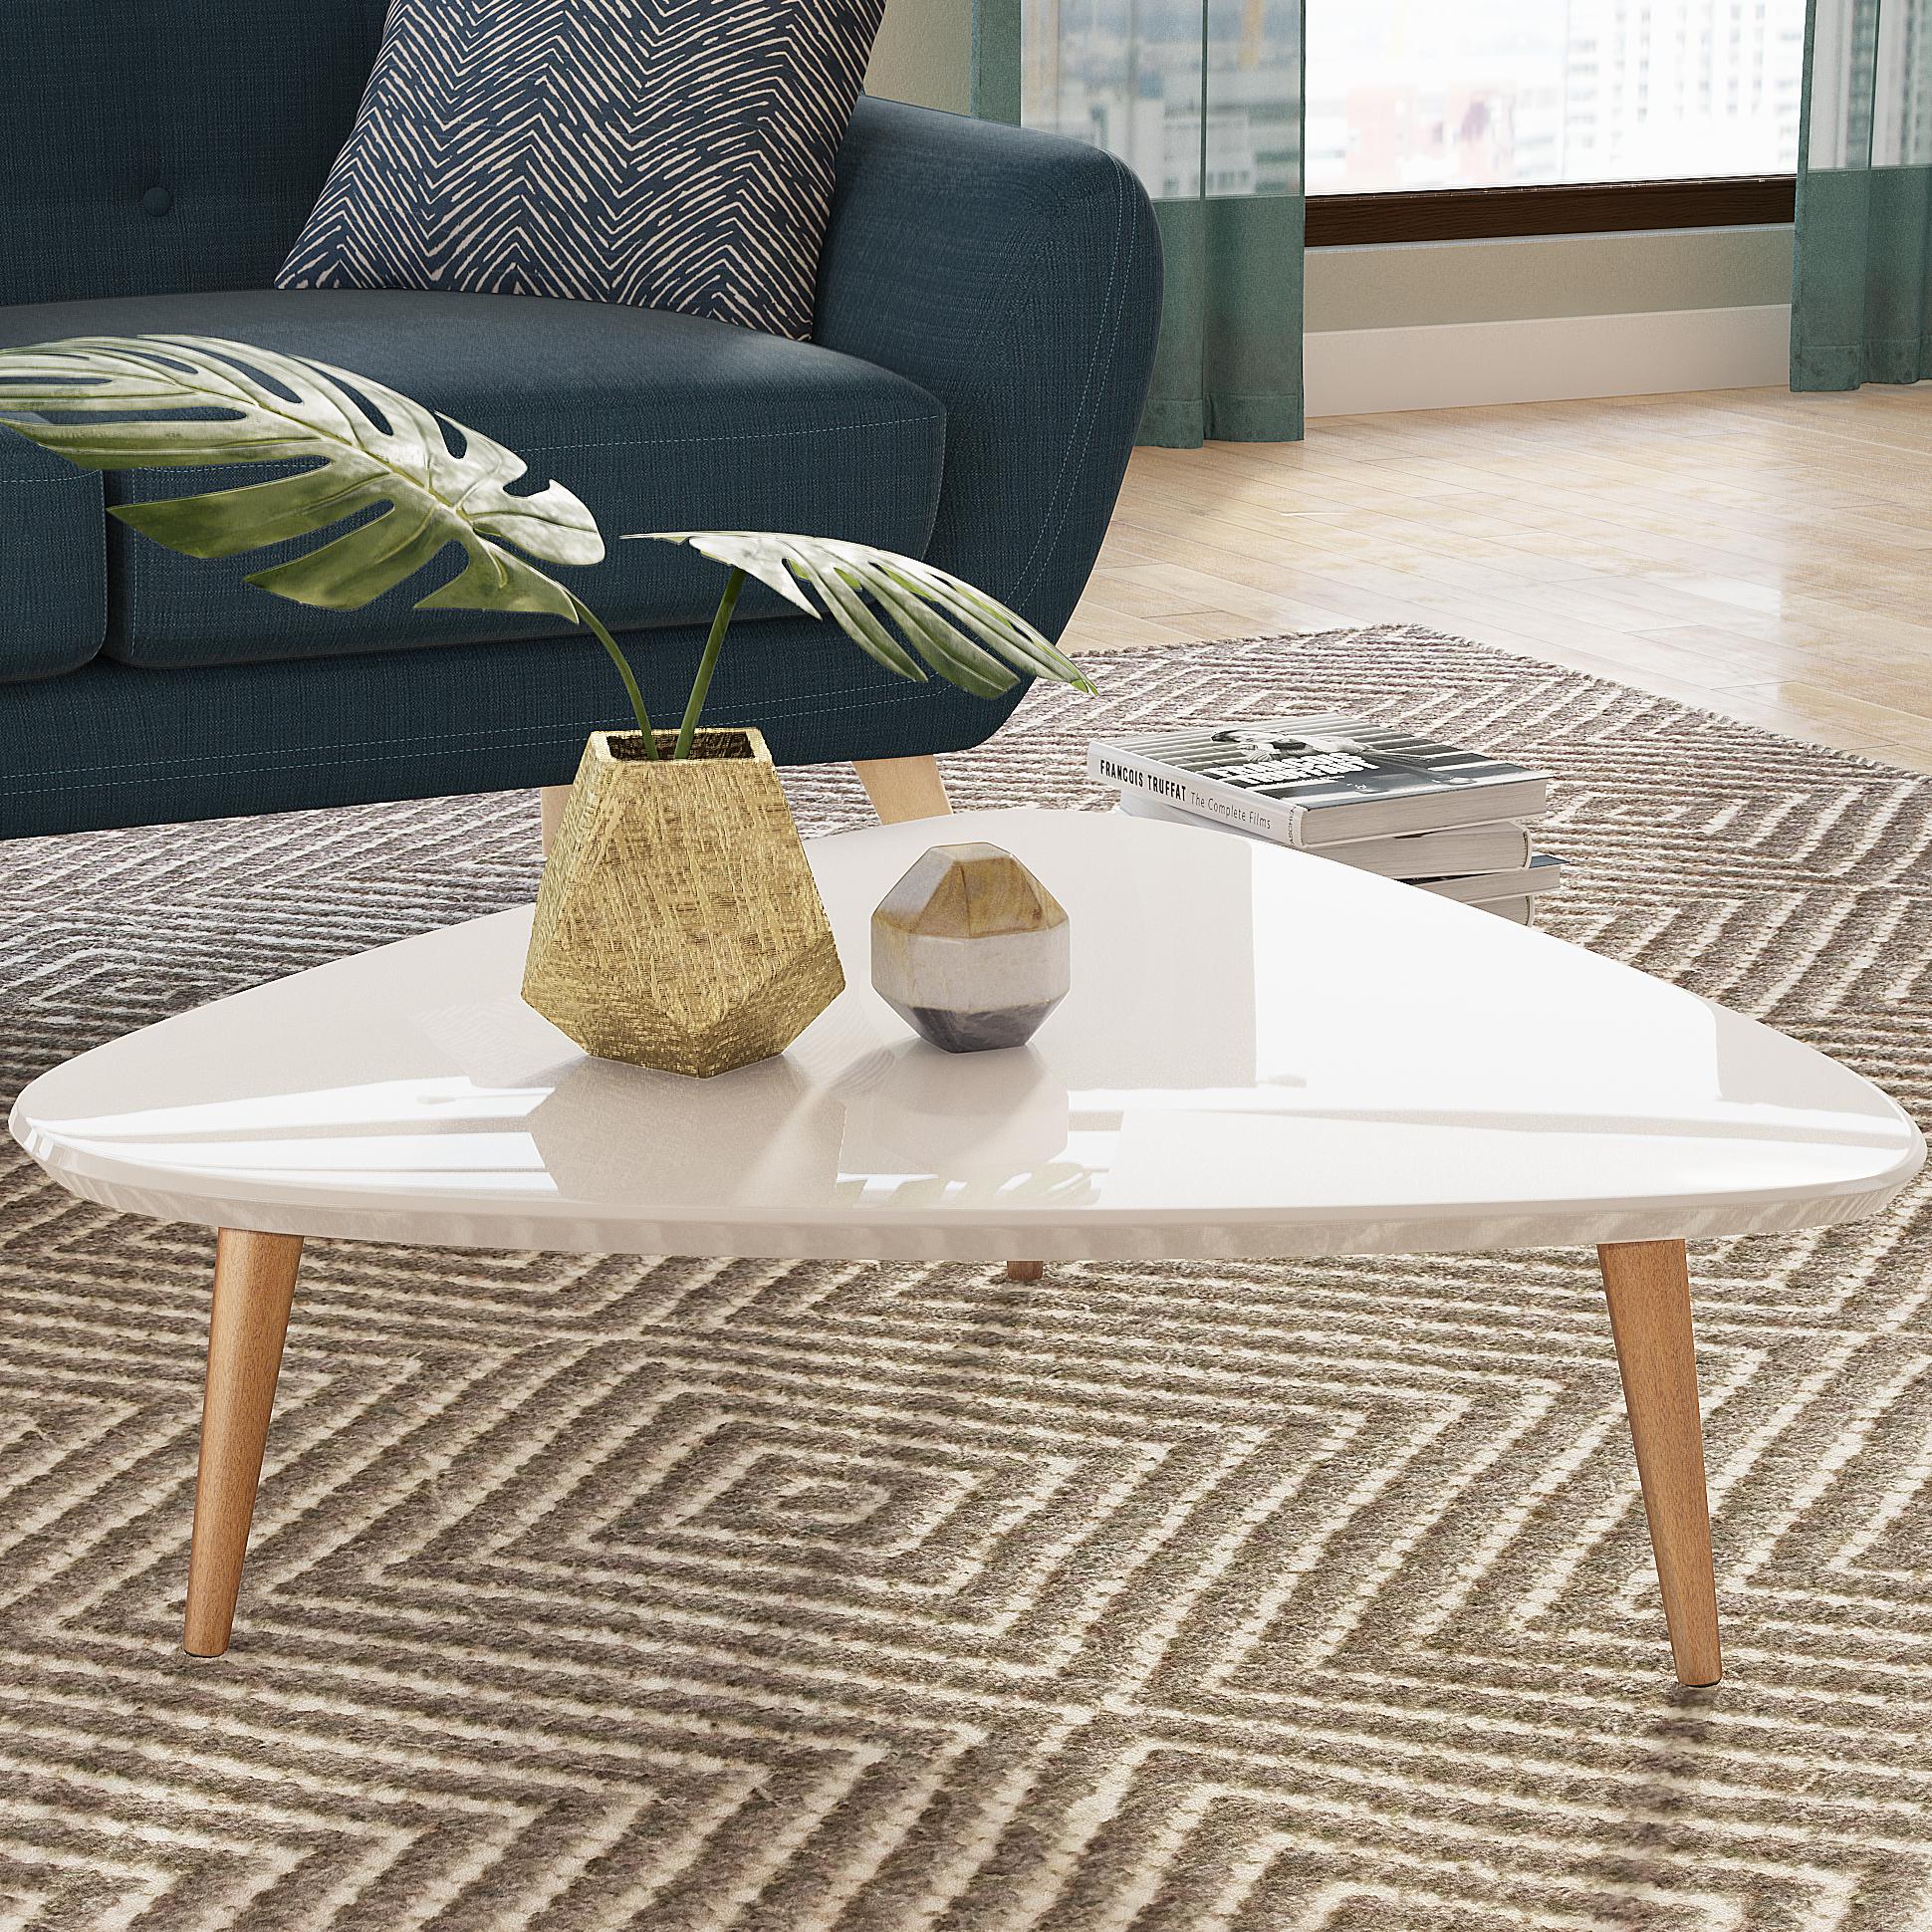 Magnificent Modern Small Space Furniture Allmodern Download Free Architecture Designs Grimeyleaguecom